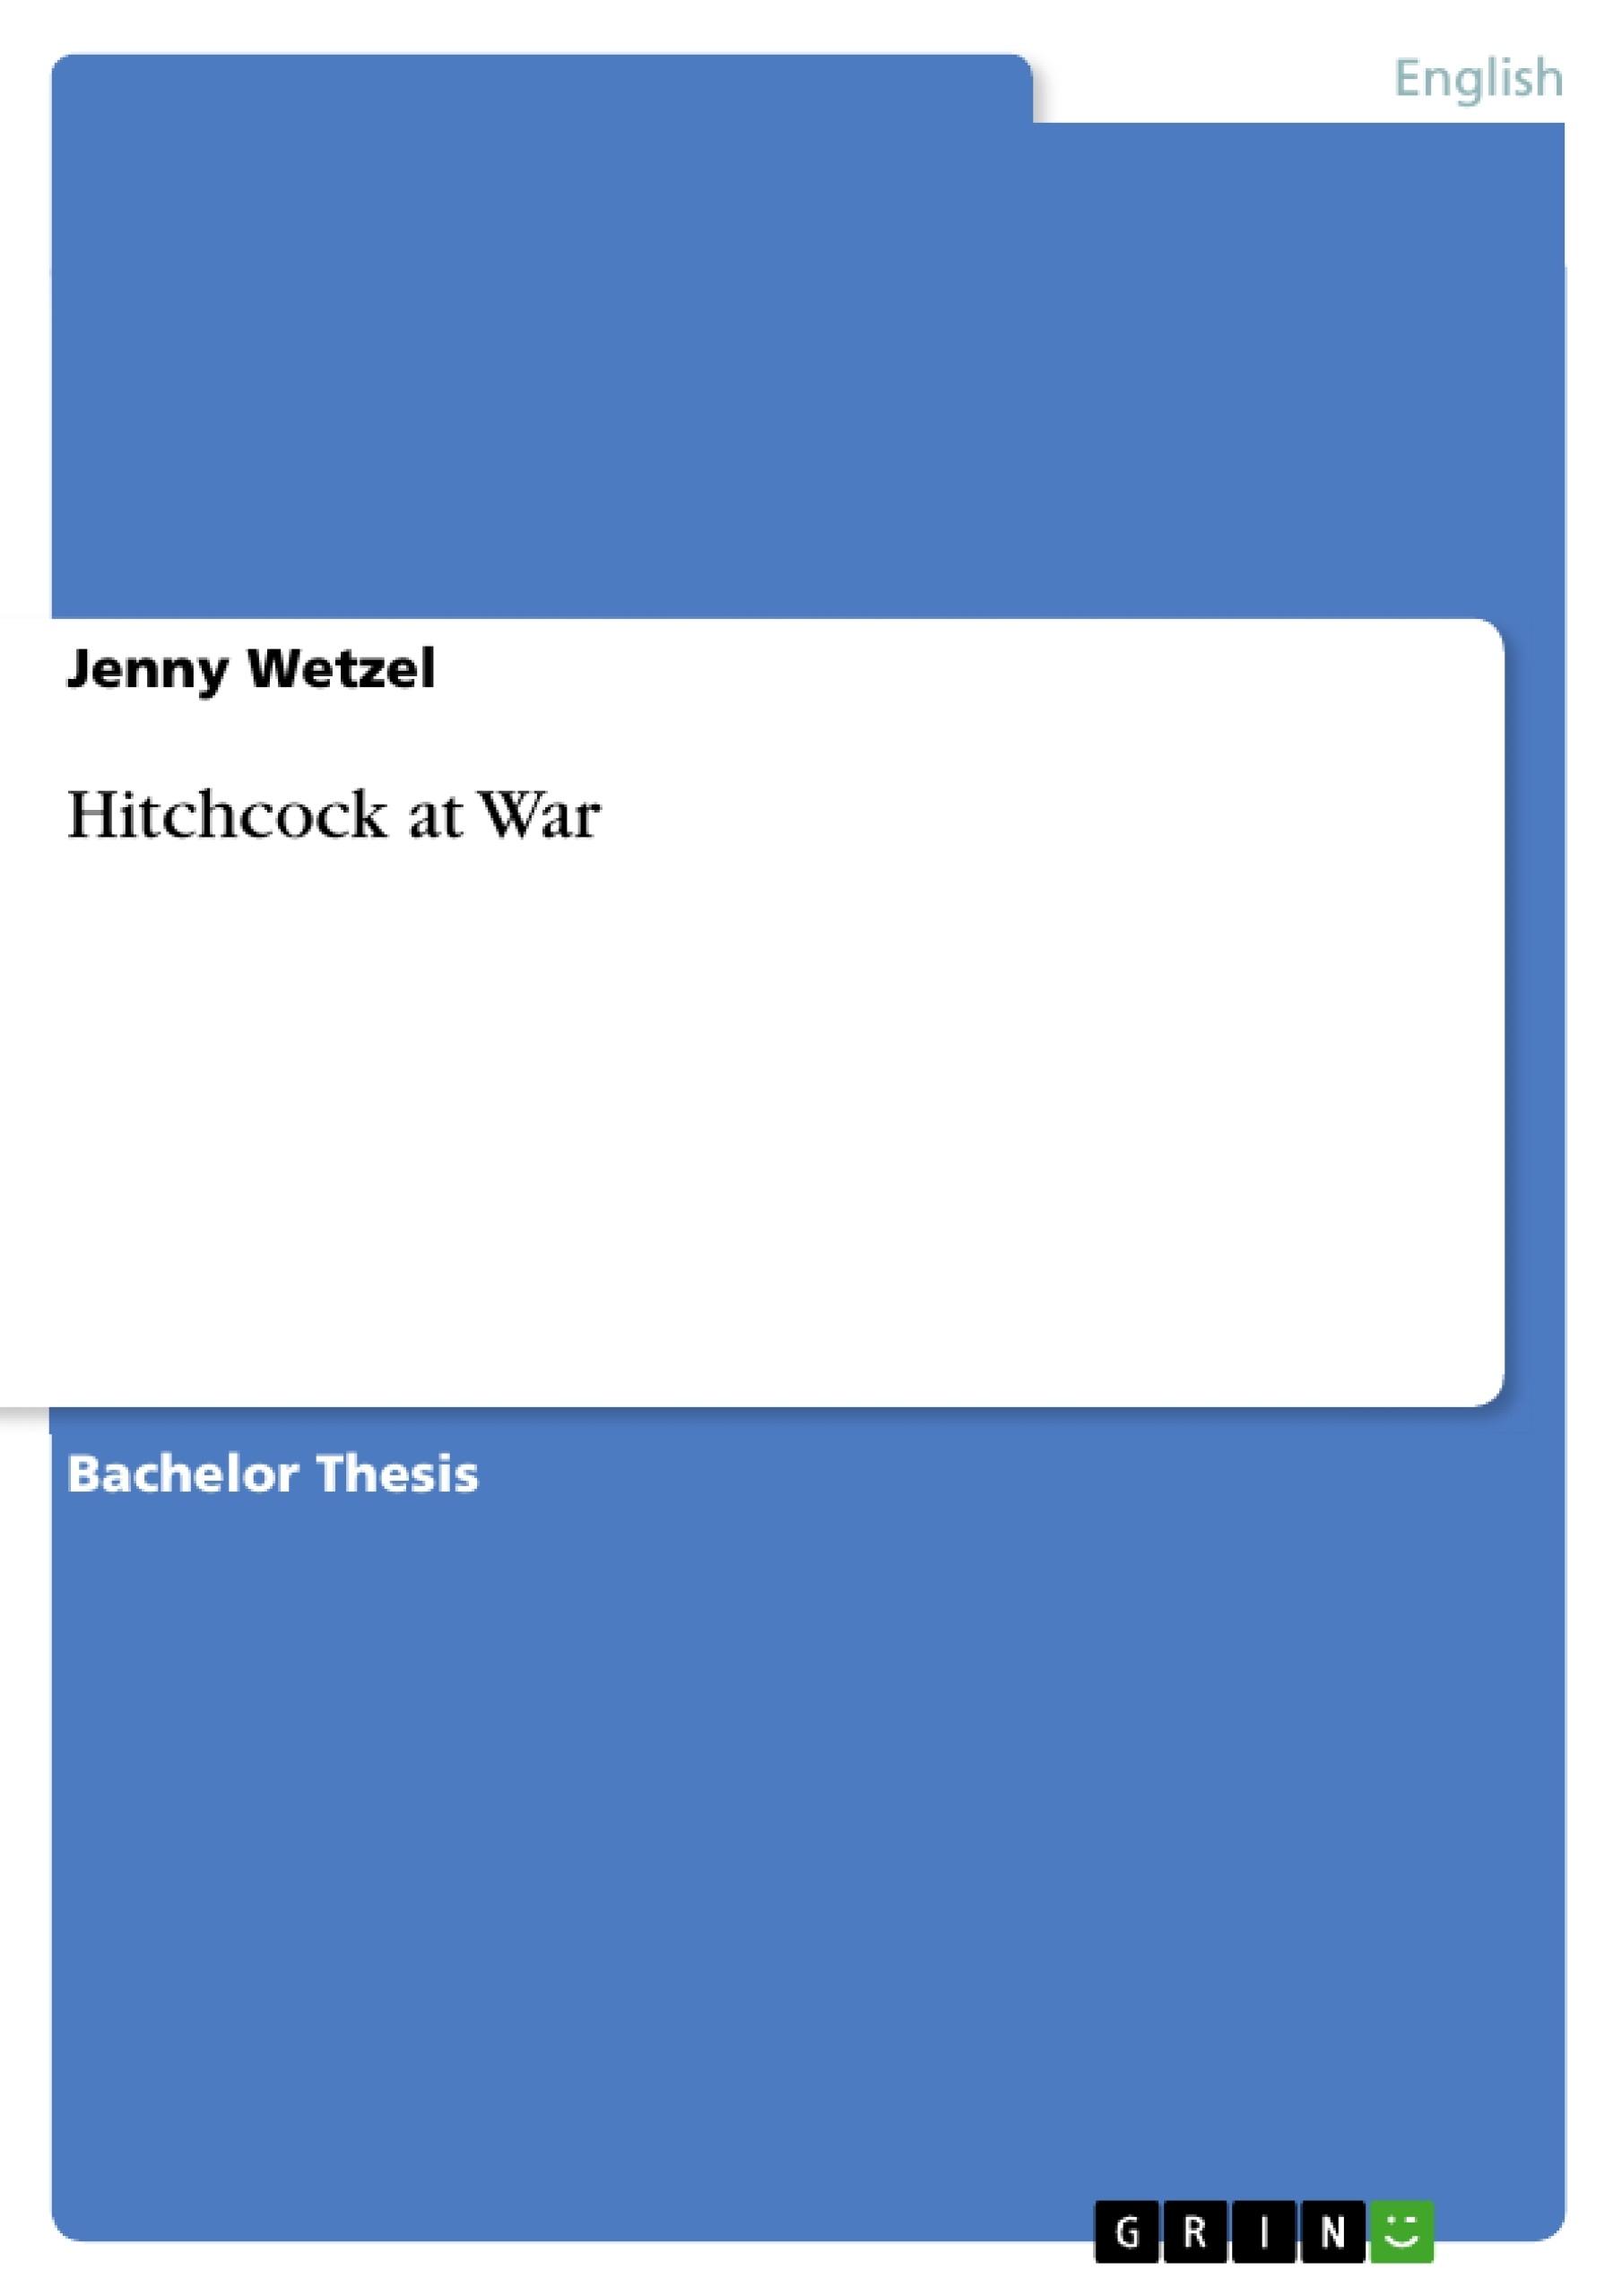 Title: Hitchcock at War